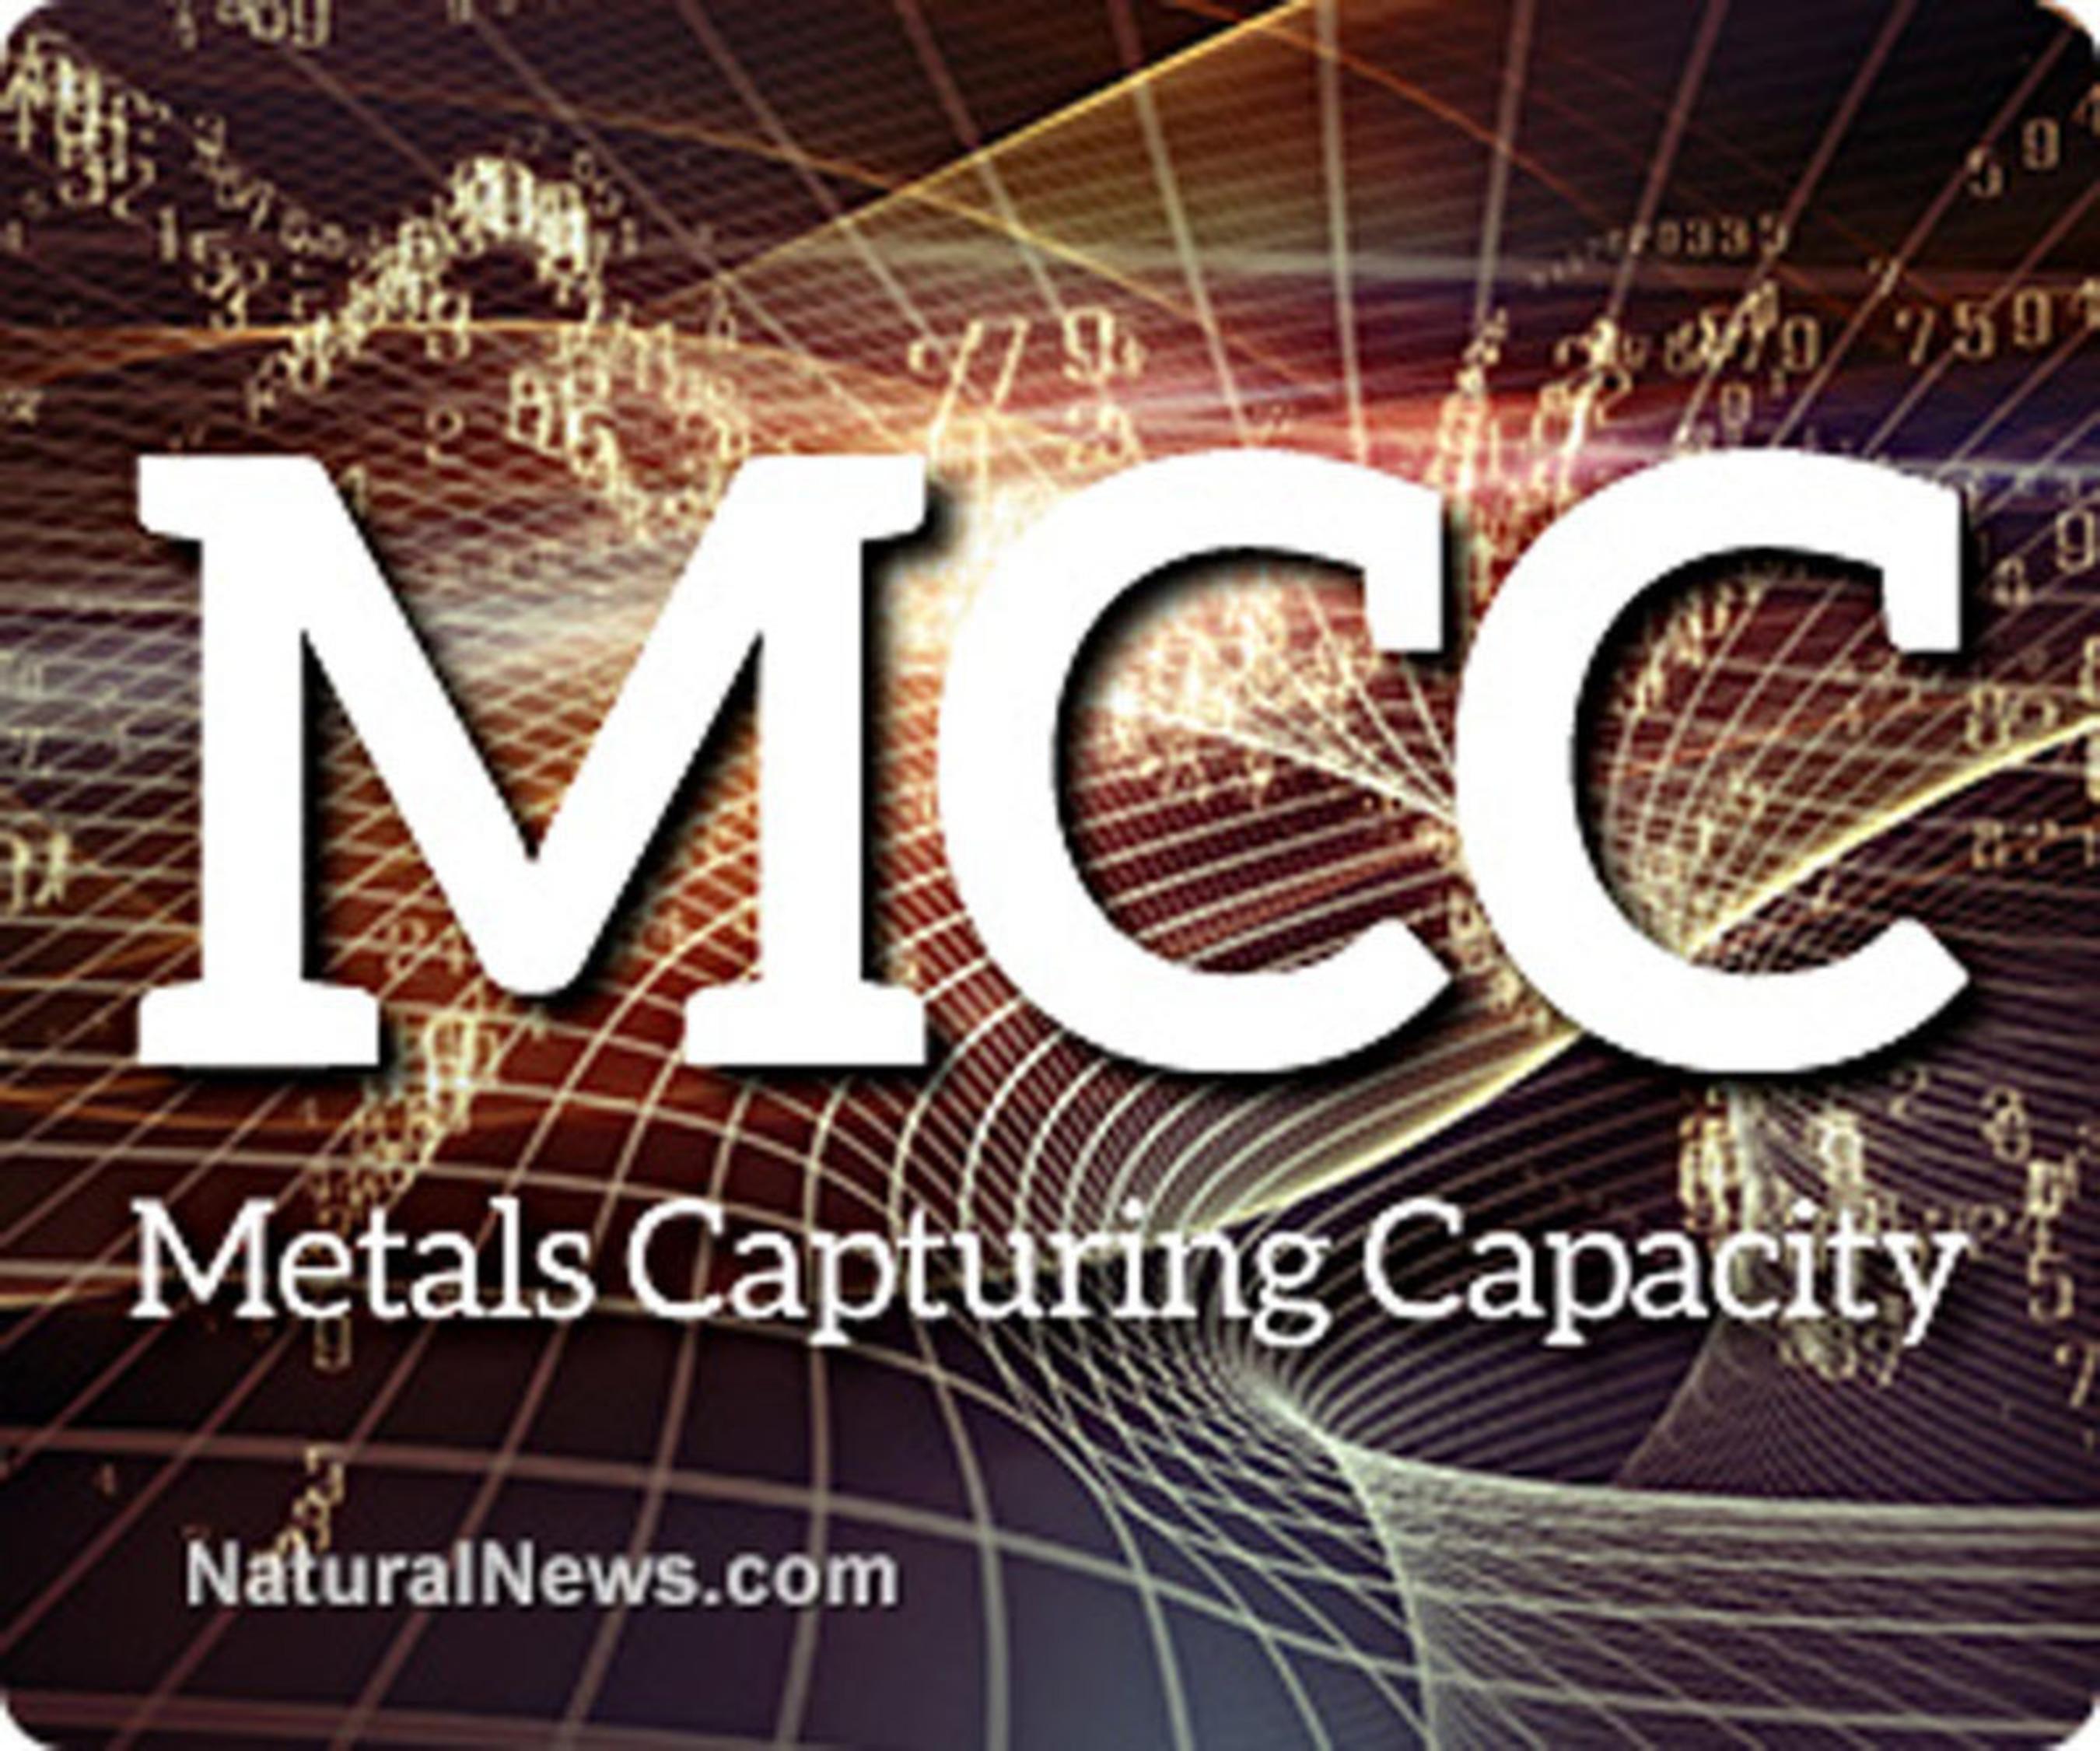 Food science breakthrough: Metals Capturing Capacity.  (PRNewsFoto/Natural News)